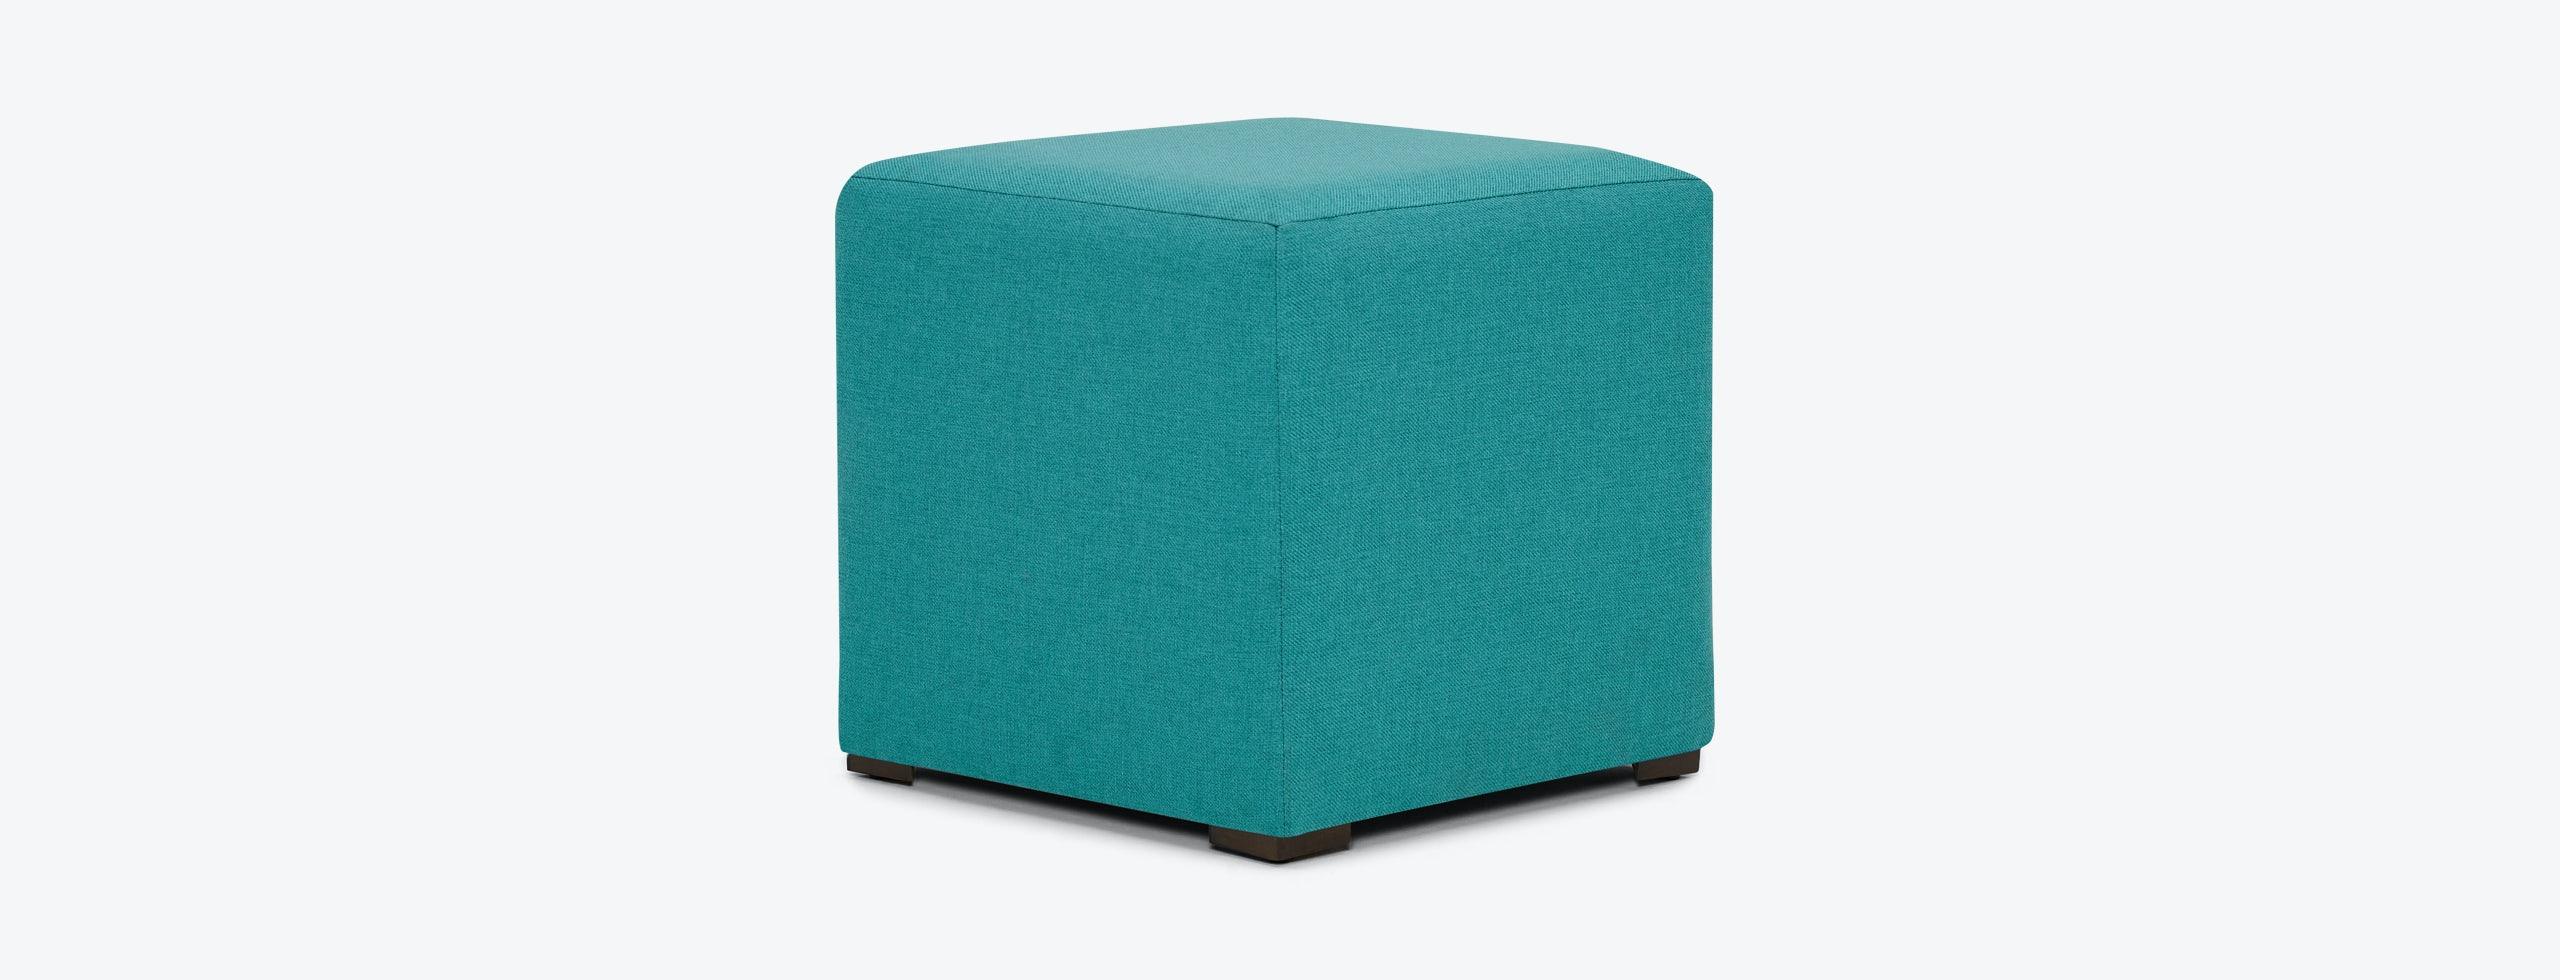 Cort Cube Ottoman Taylor Tonic